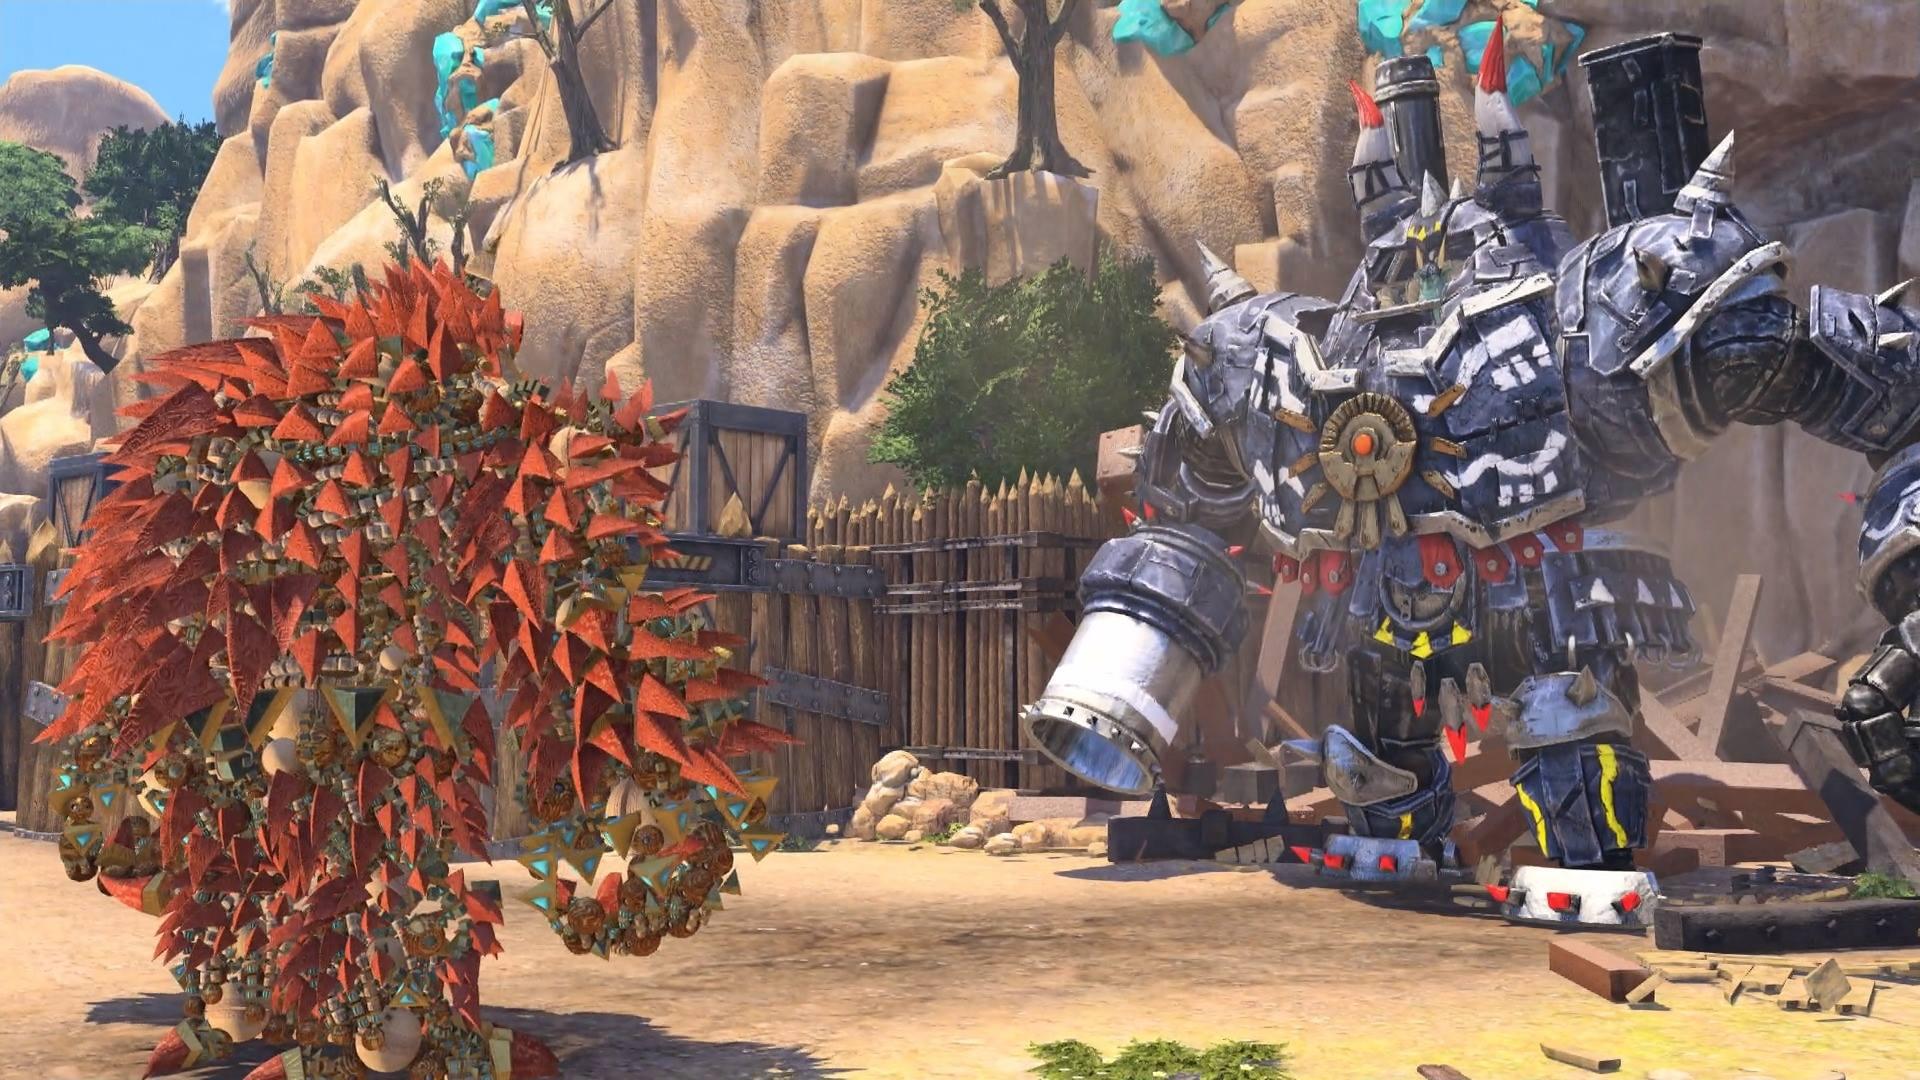 PlayStation 4 Knack SCE Japan Studios Sony is like PlayStation 1 classics PS1 Crash Bandicoot Spyro etc.